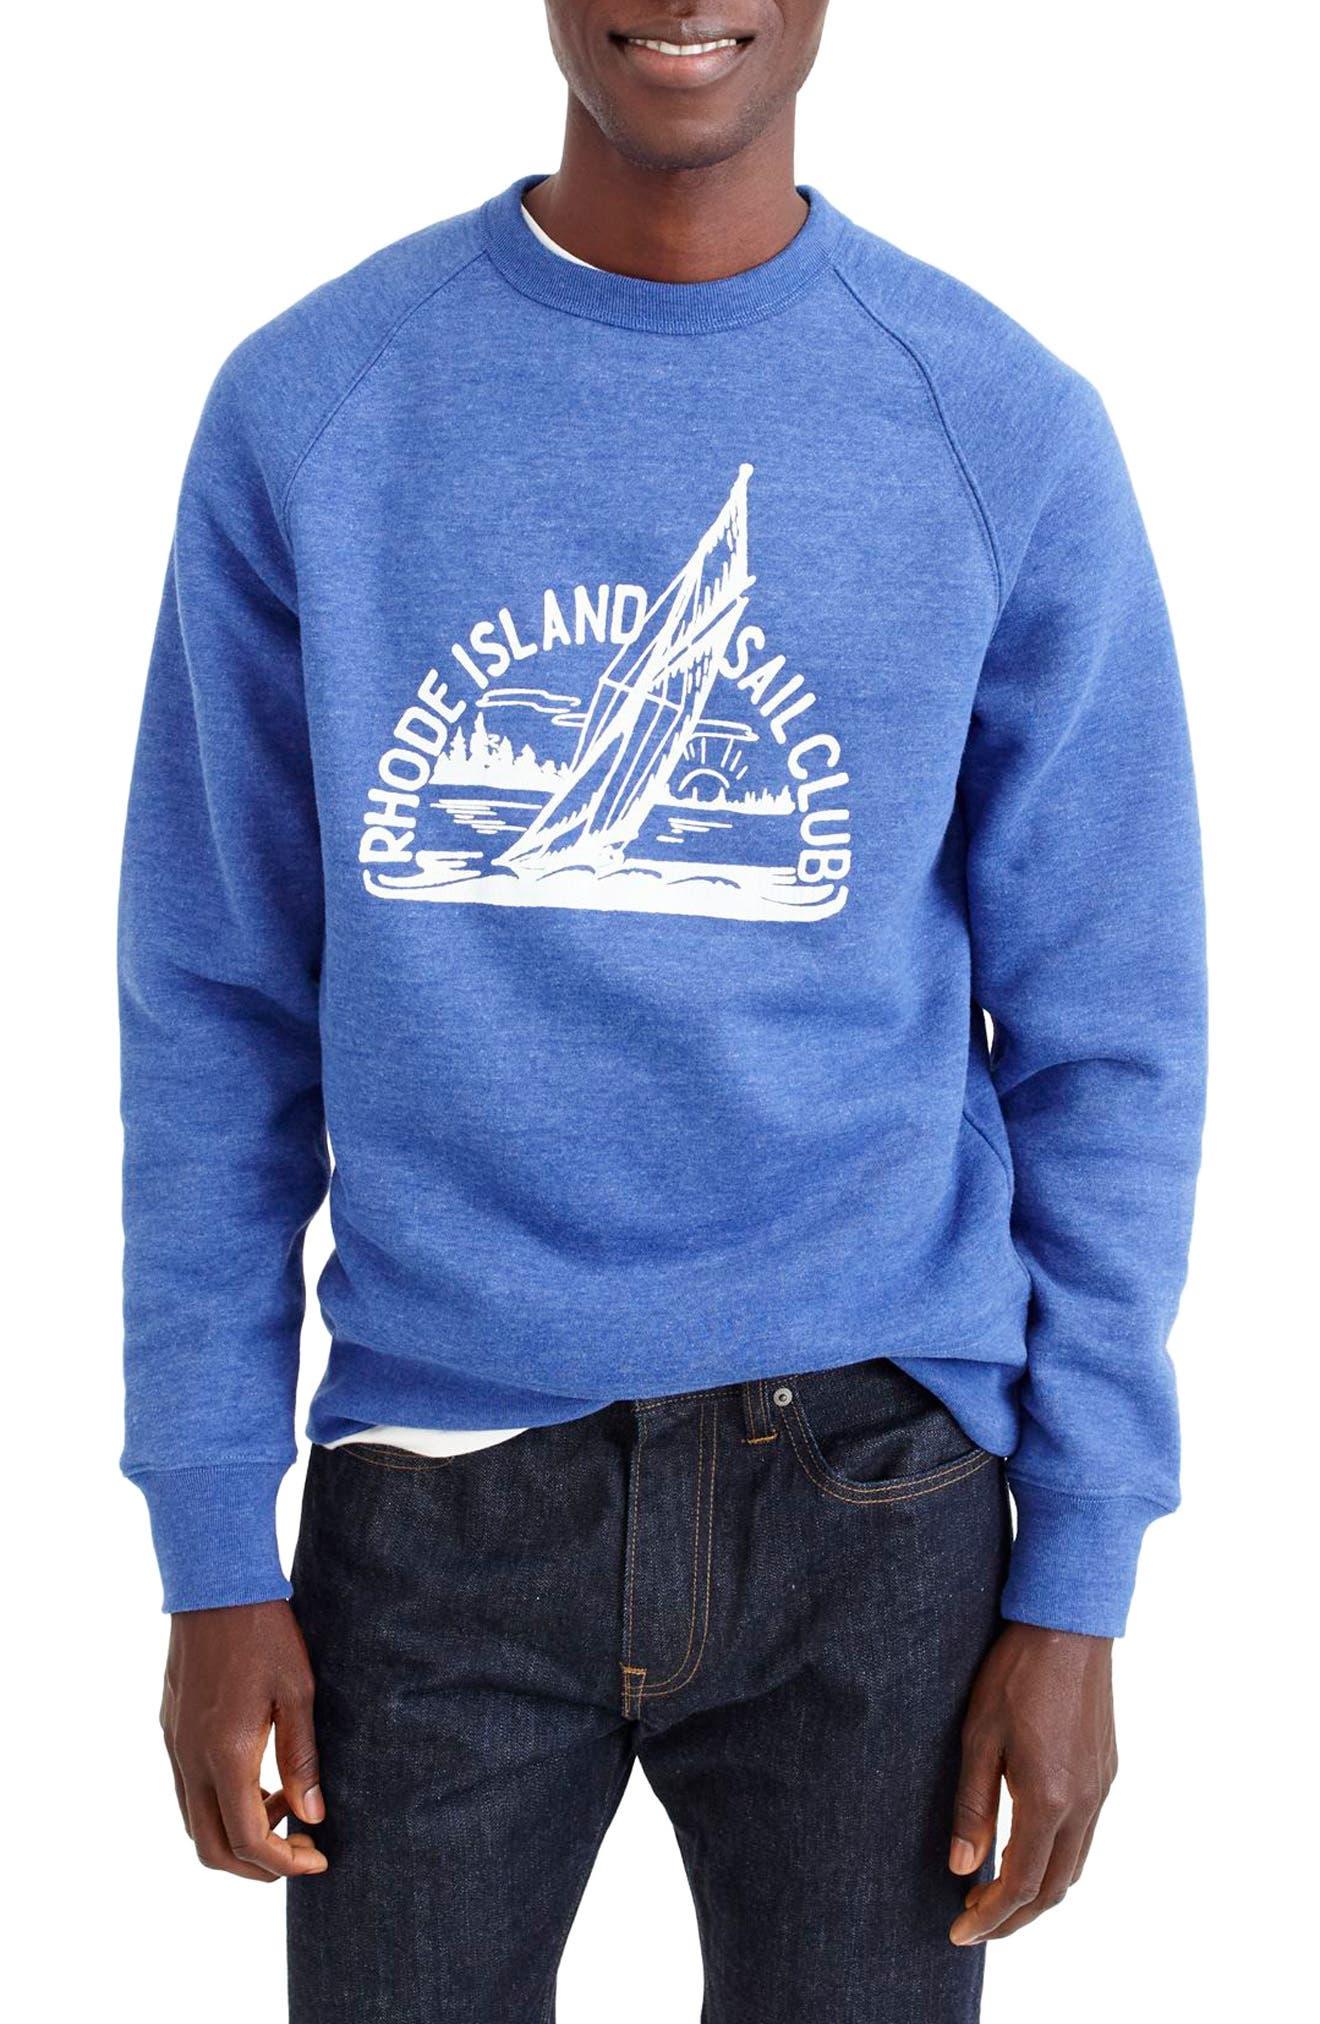 J.Crew Rhode Island Sail Club Sweatshirt